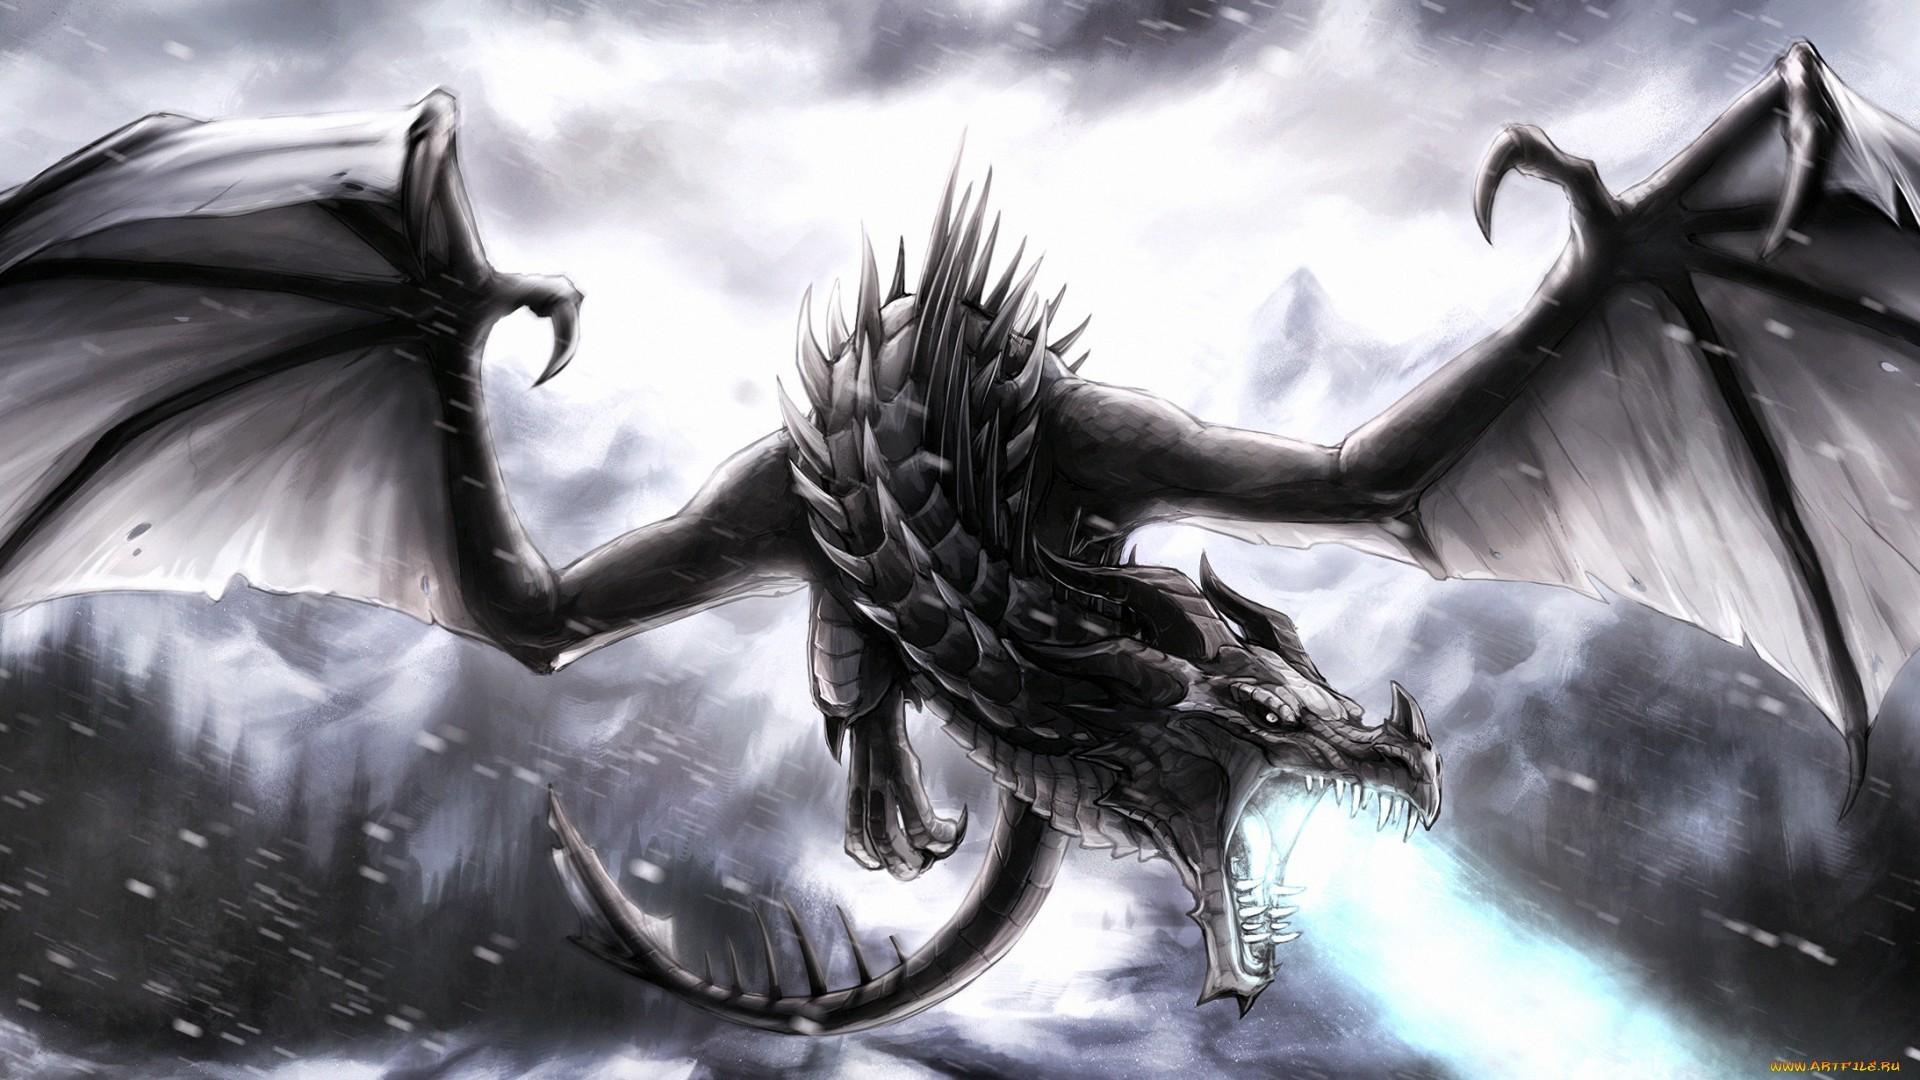 Black dragon wallpaper widescreen